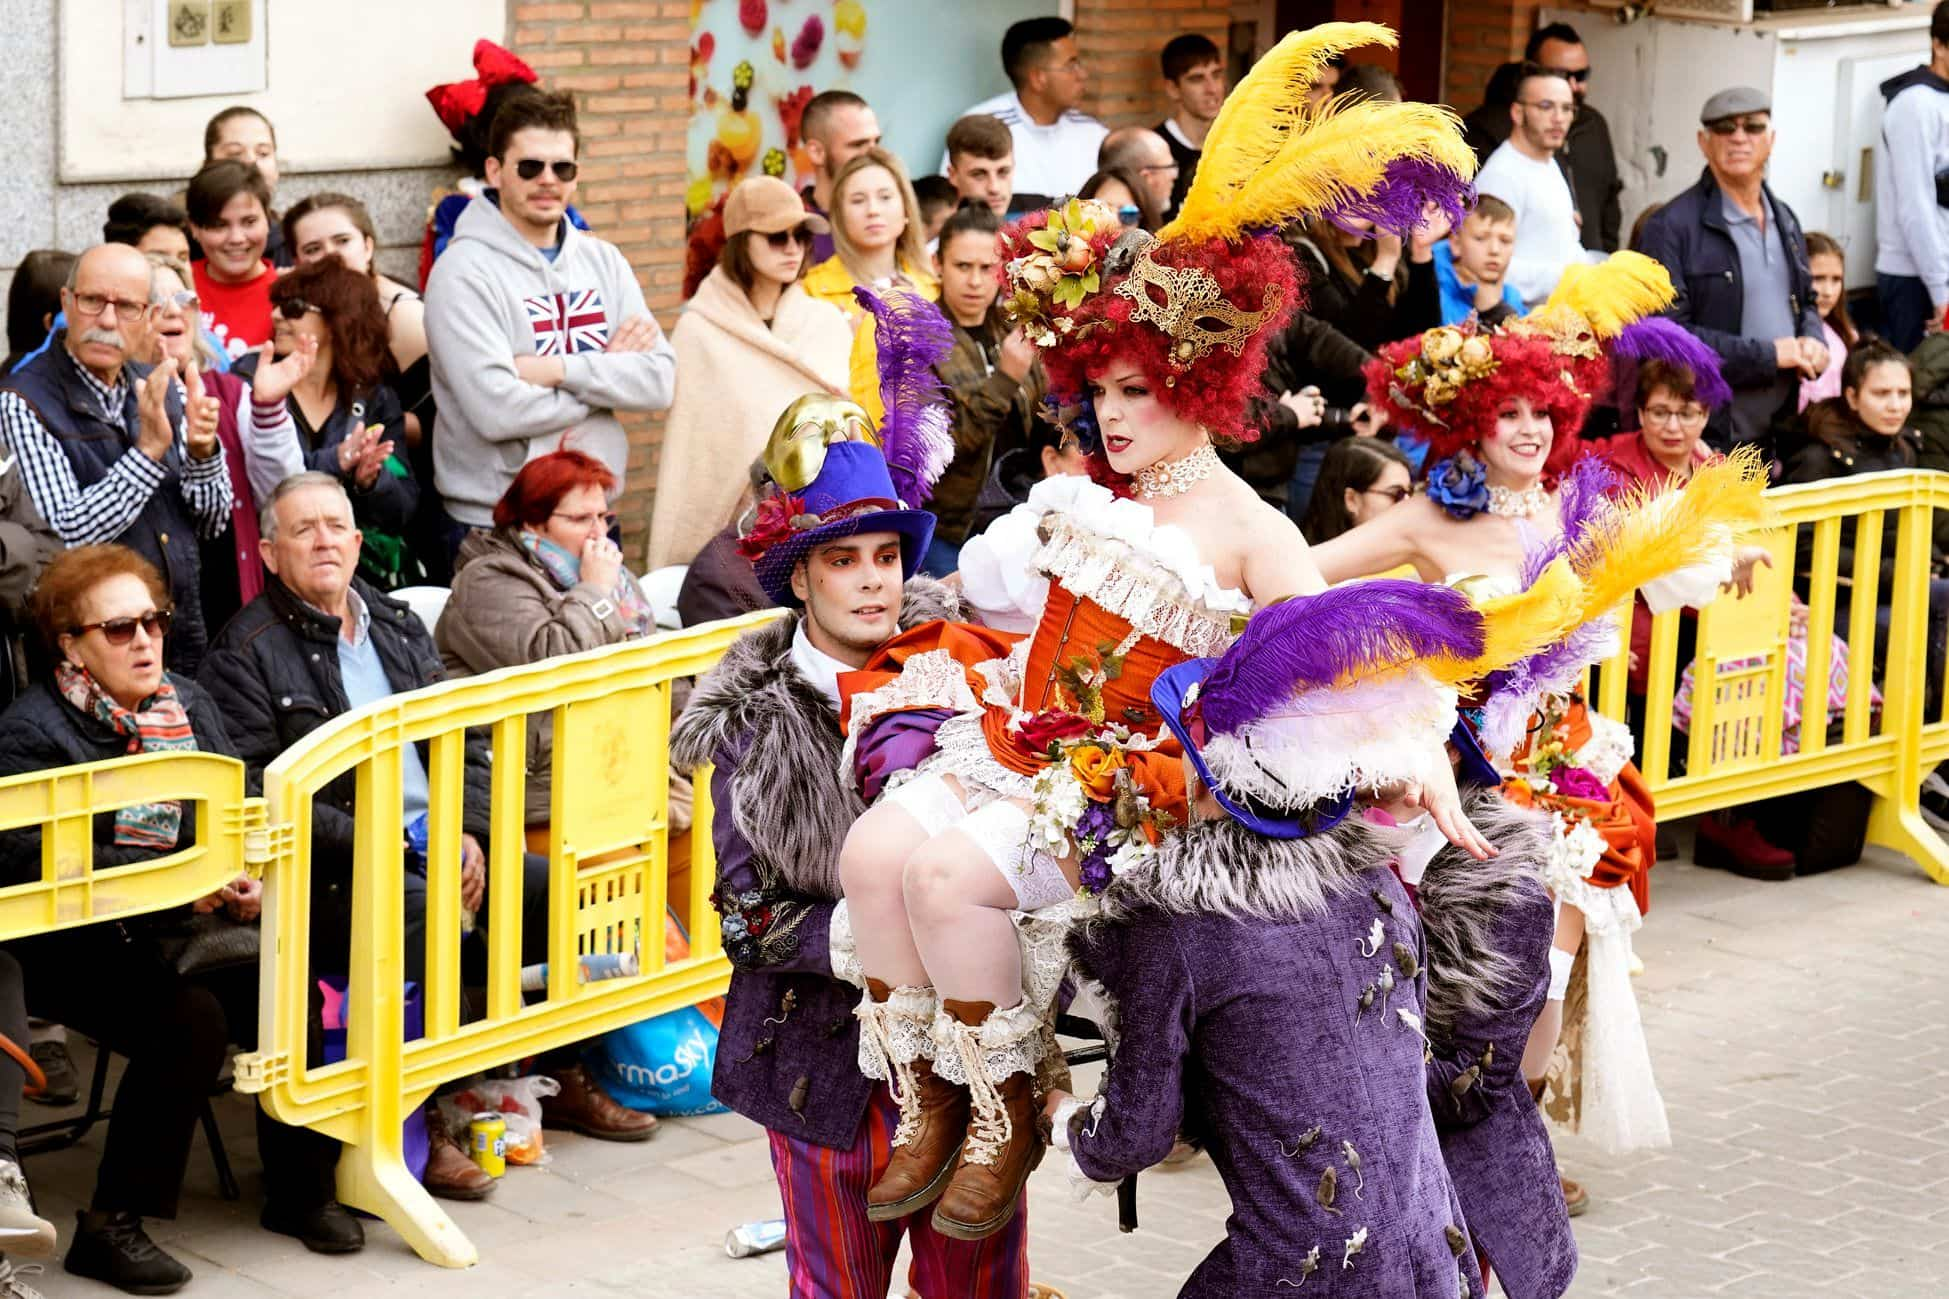 Carnaval de herencia 2020 ofertorio 132 - Selección de fotografías del Ofertorio del Carnaval de Herencia